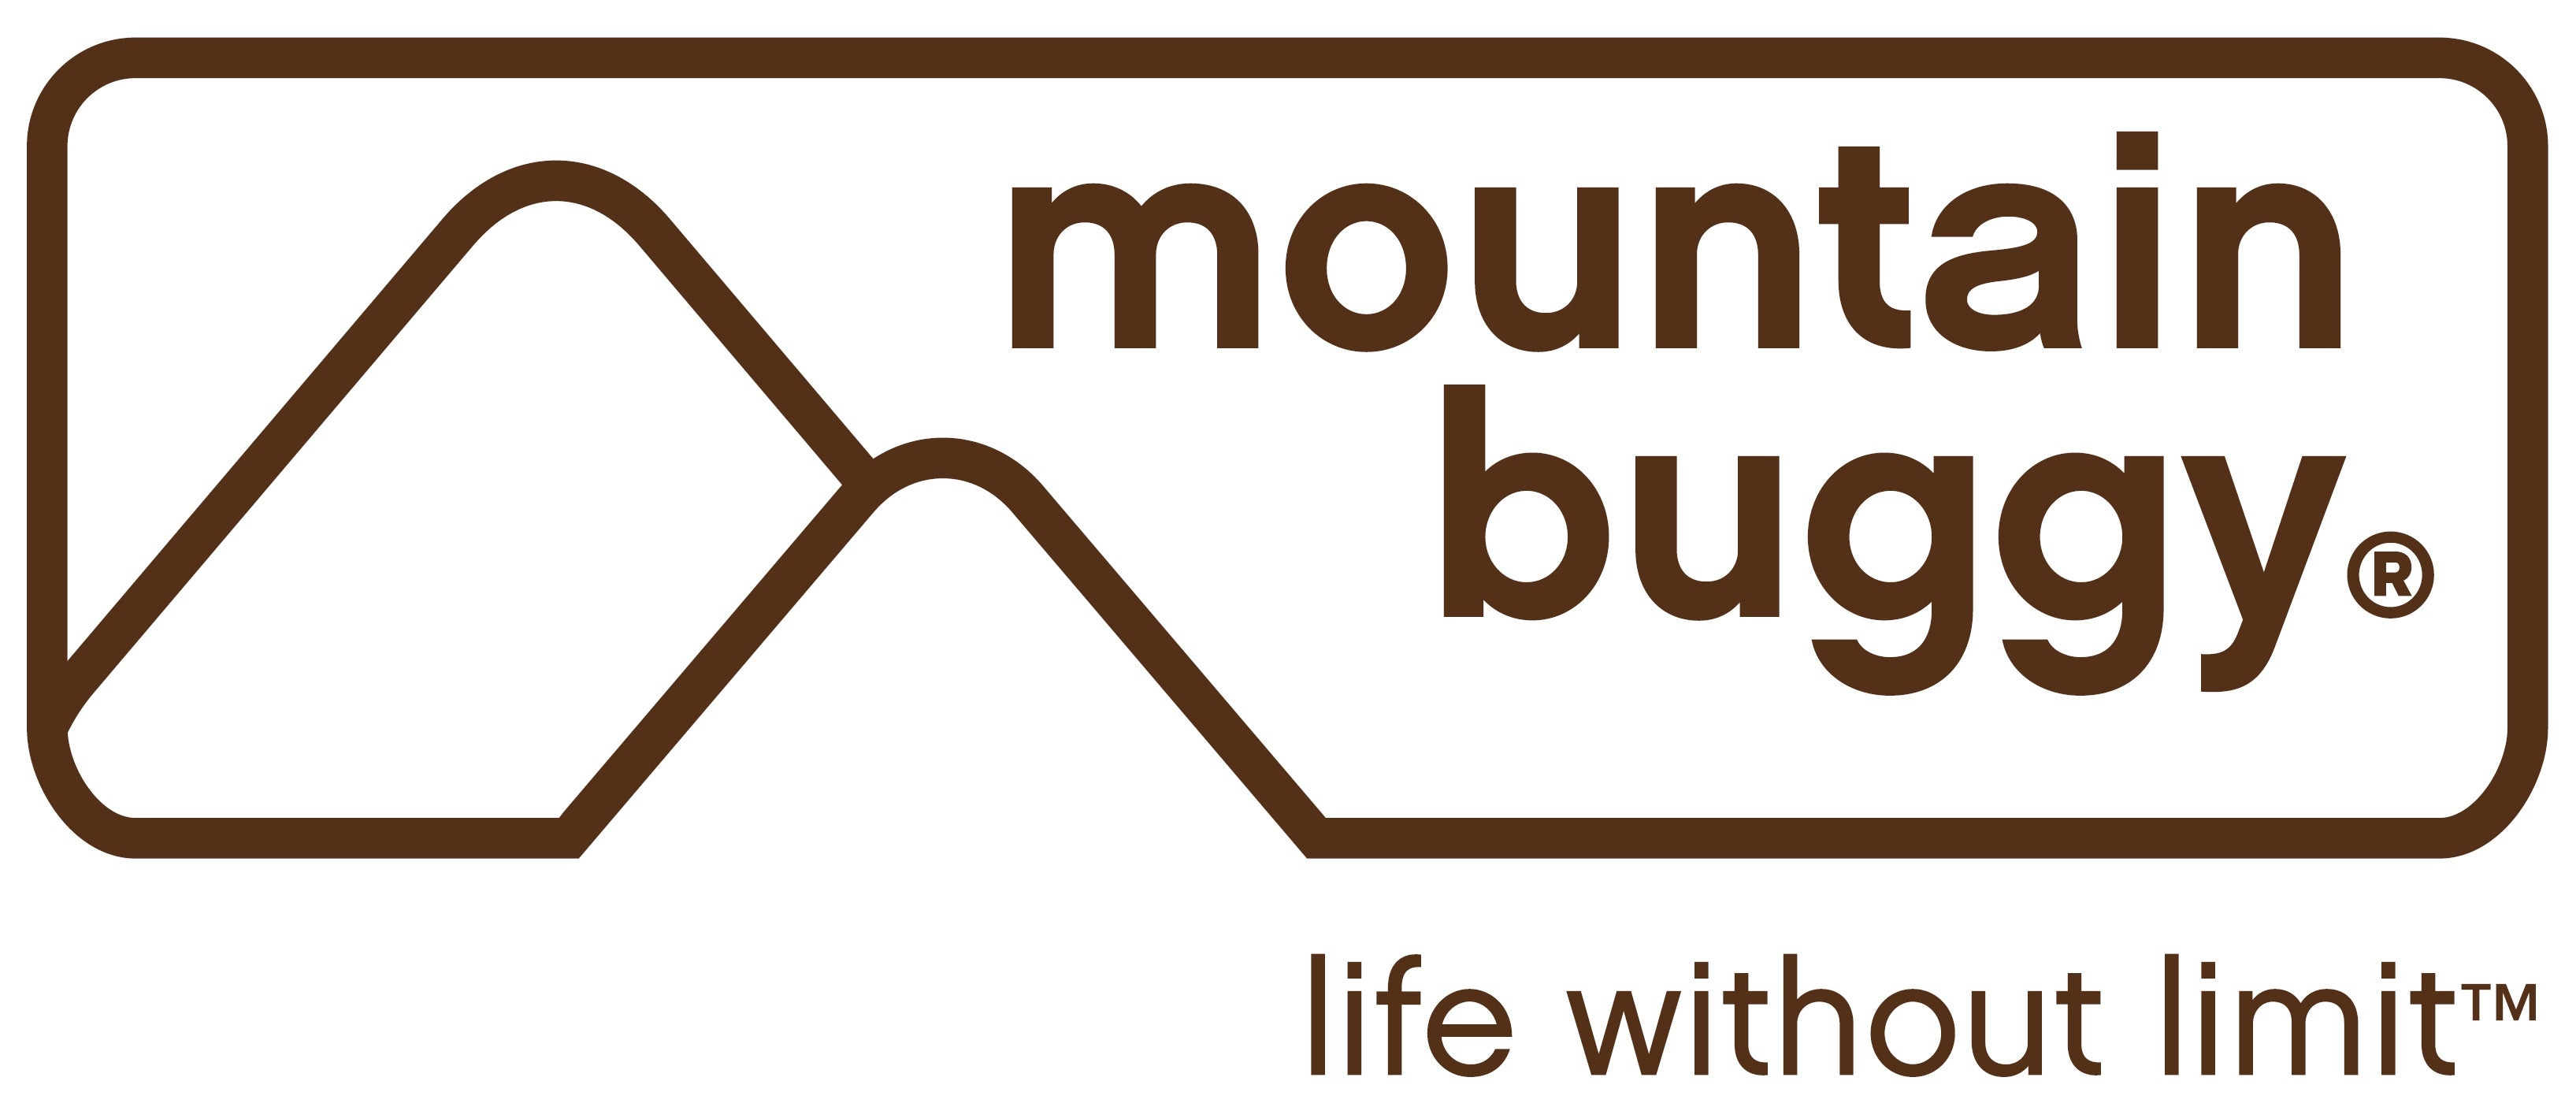 Vis mere fra MOUNTAIN BUGGY